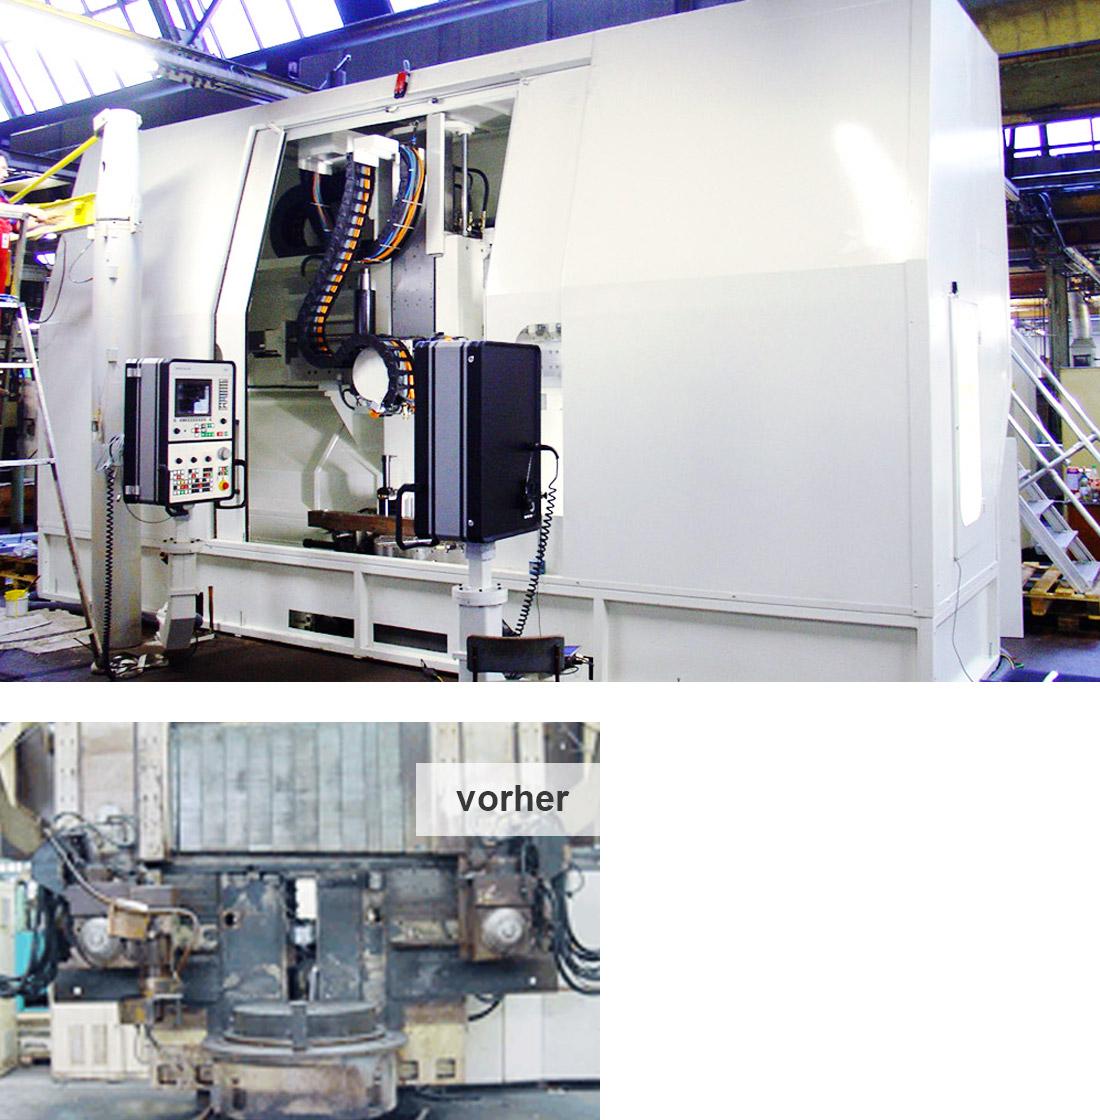 EDM Technik, Modernisierung, Wartung, Generalüberholung, Service, Werkzeugmaschinen, Maschinenbau